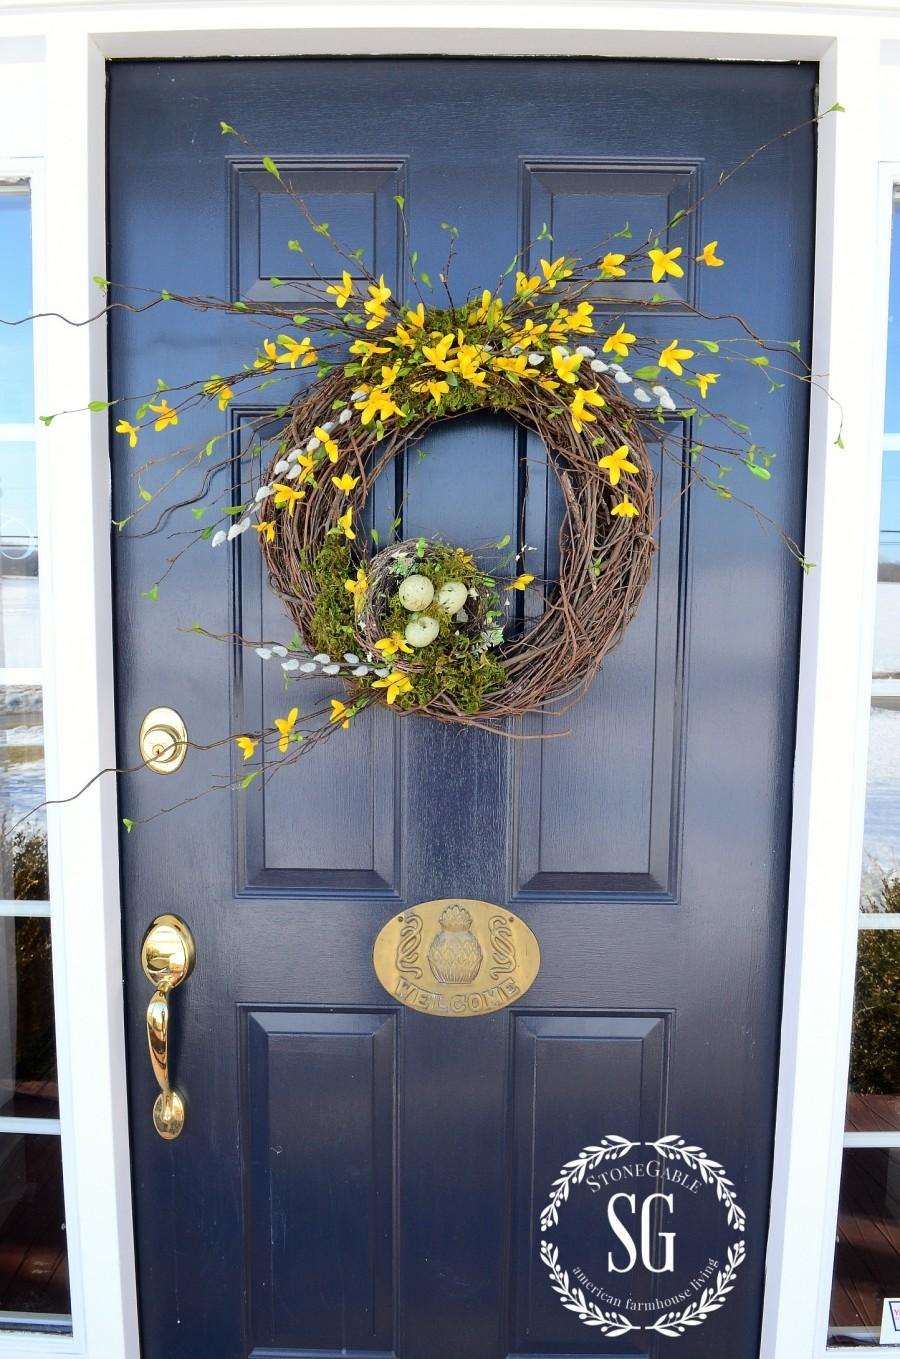 5 QUESTIONS YOU ASKED STONEGABLE-door color-stonegableblog.com